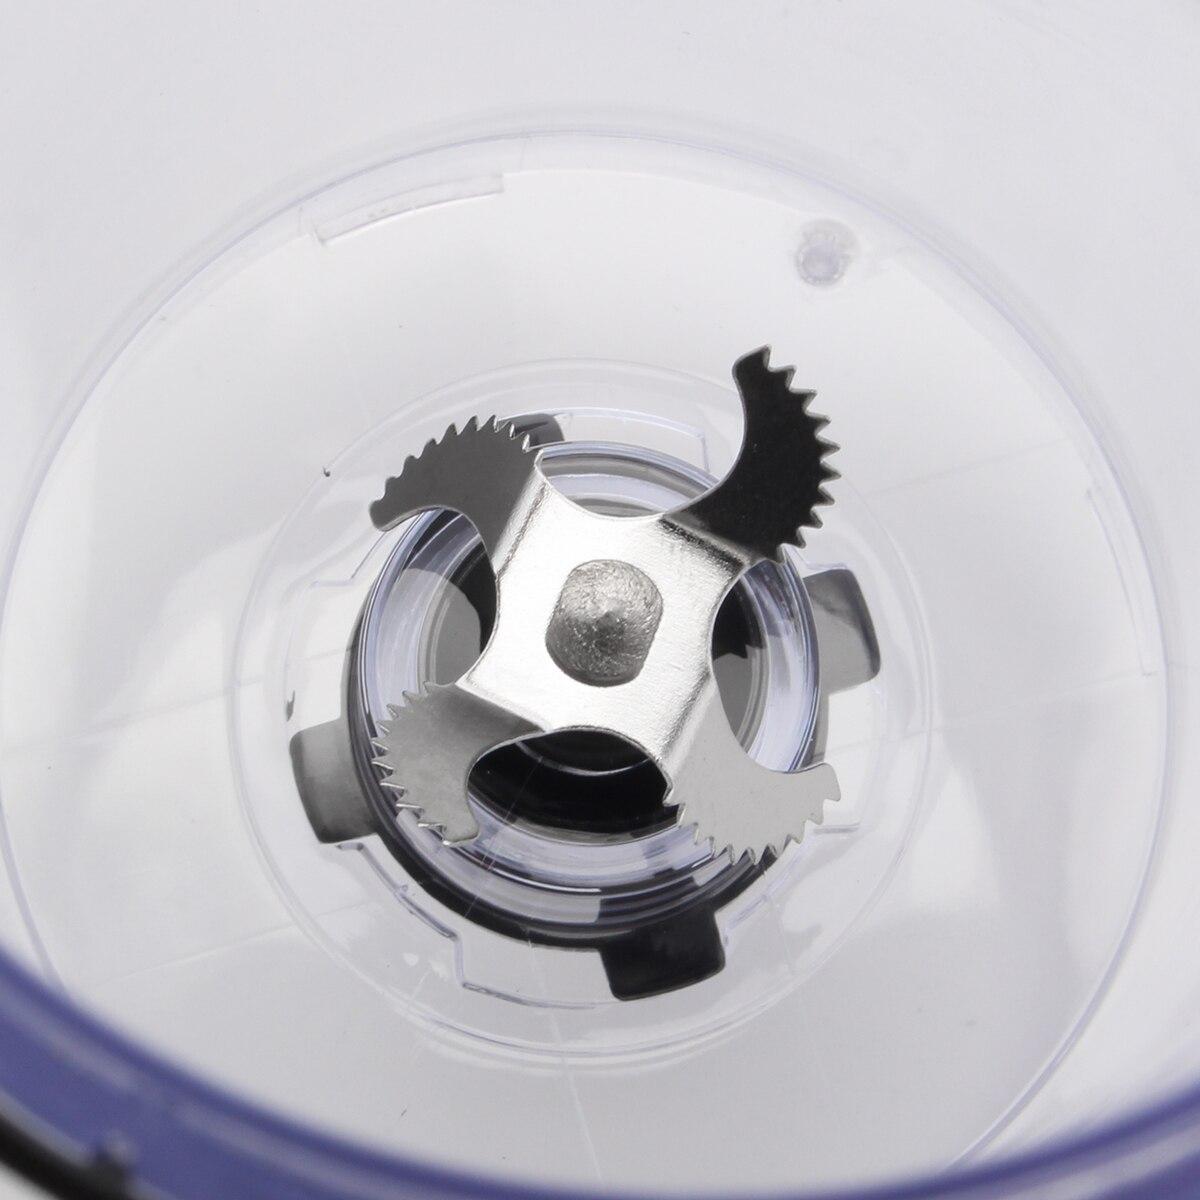 Hf1e1206fa1f0488fba6c6ff94895e7e2i 2019 250ML Electric Protein Shake Stirrer USB Shake Bottle Milk Coffee Blender Kettle Fitness Vortex Tornado Smart Mixer